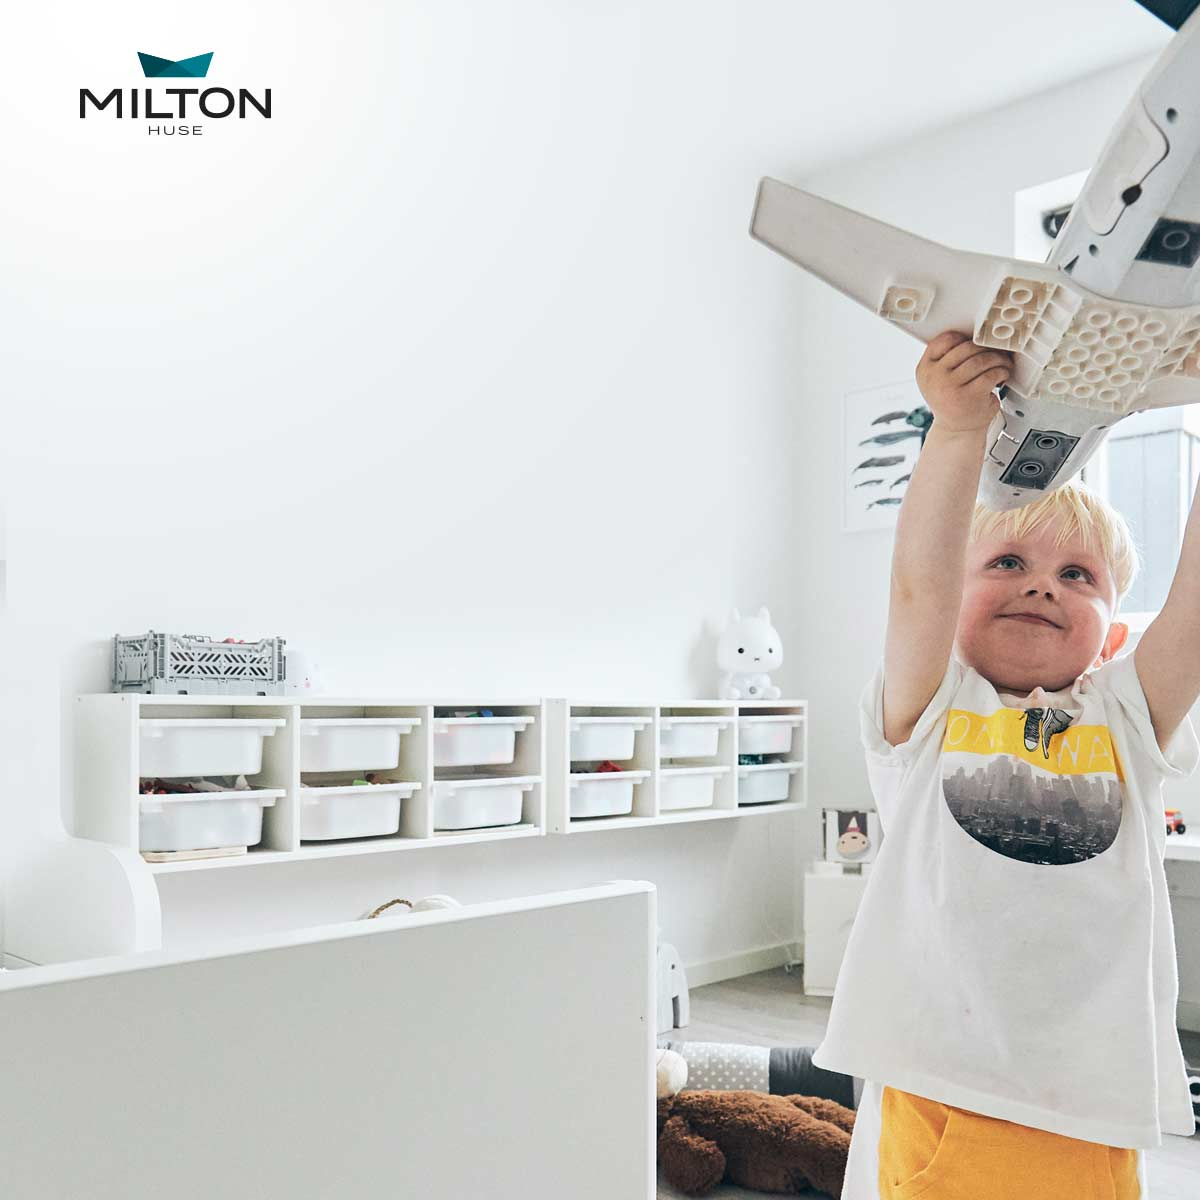 Milton Huse giver inspiration til nybyggere